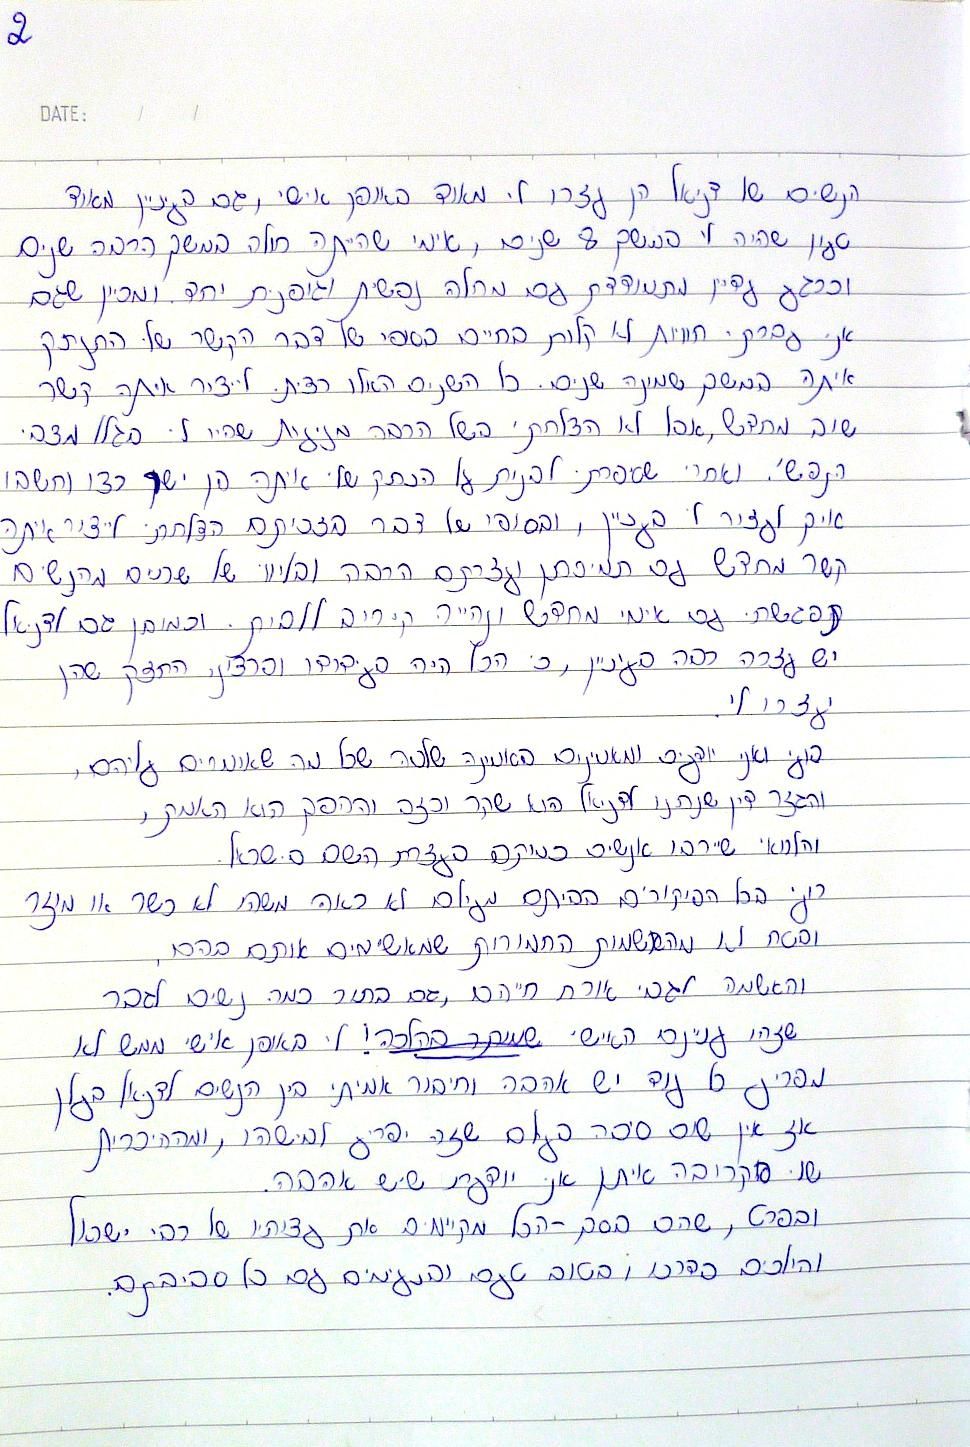 testimonie of Elia Aviv 2.JPG